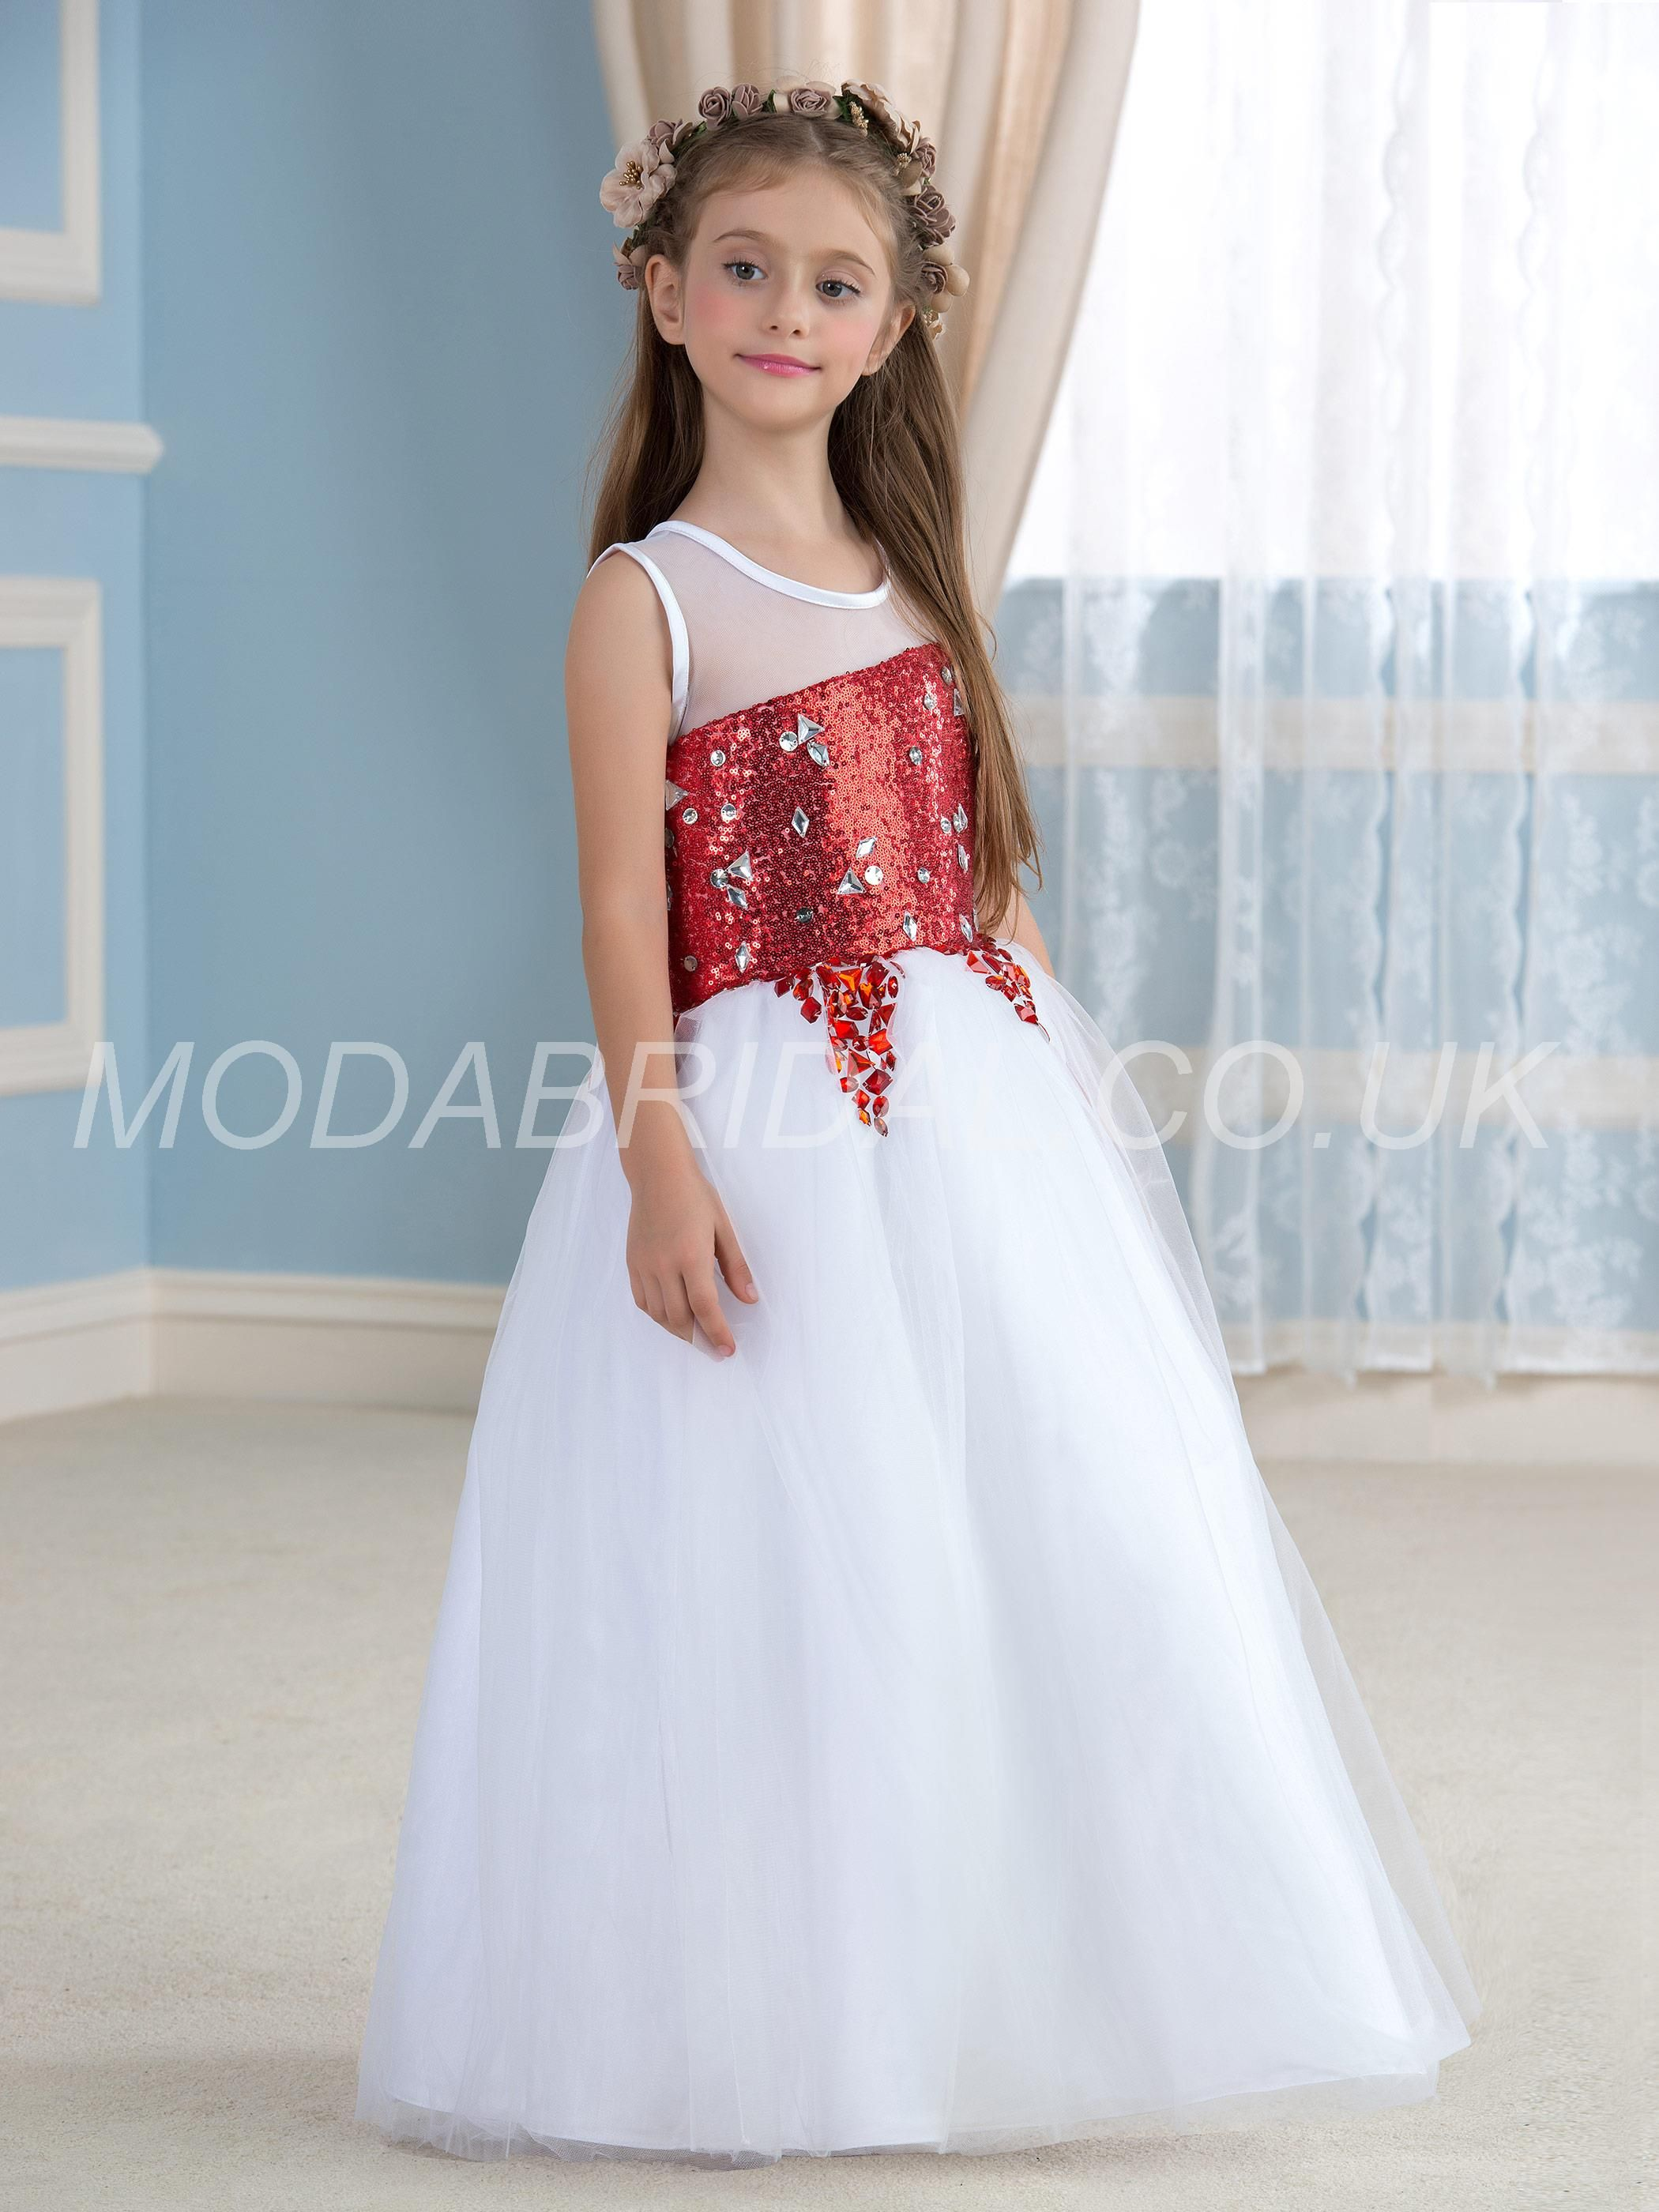 modabridal.co.uk SUPPLIES Fashionable FloorLength Sequins